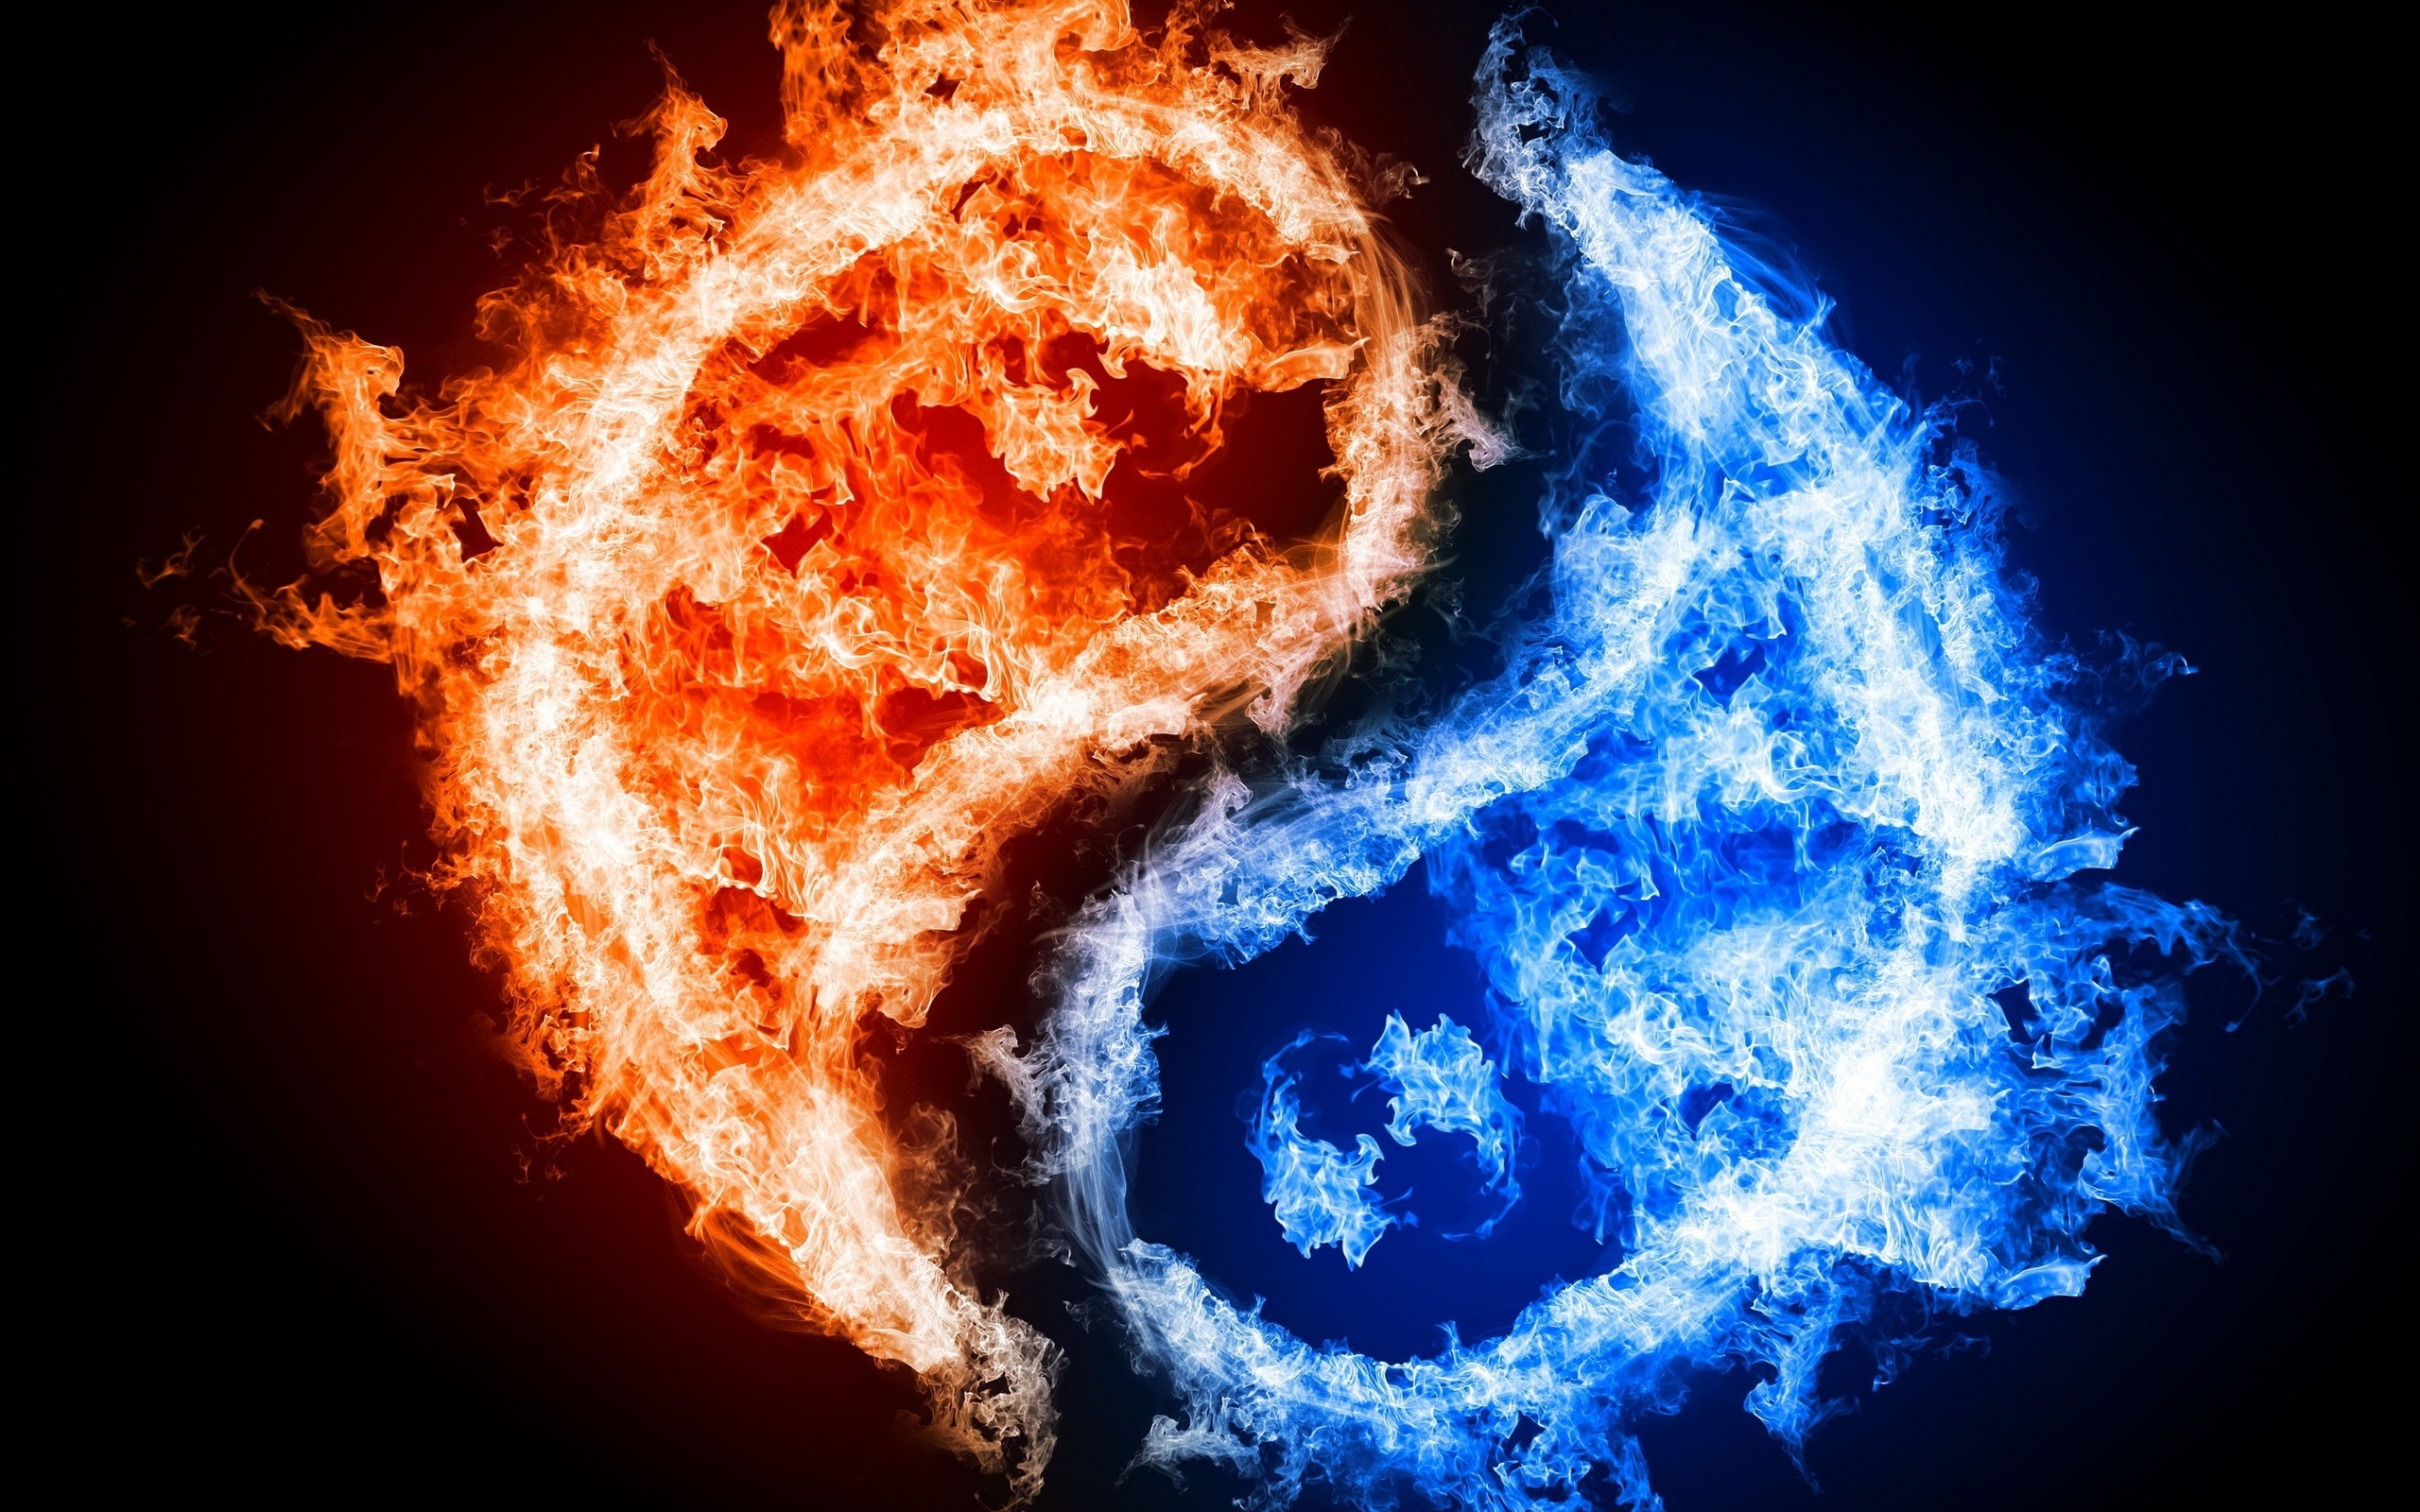 Description: Free Download Fire Red Blue Wallpaper in .